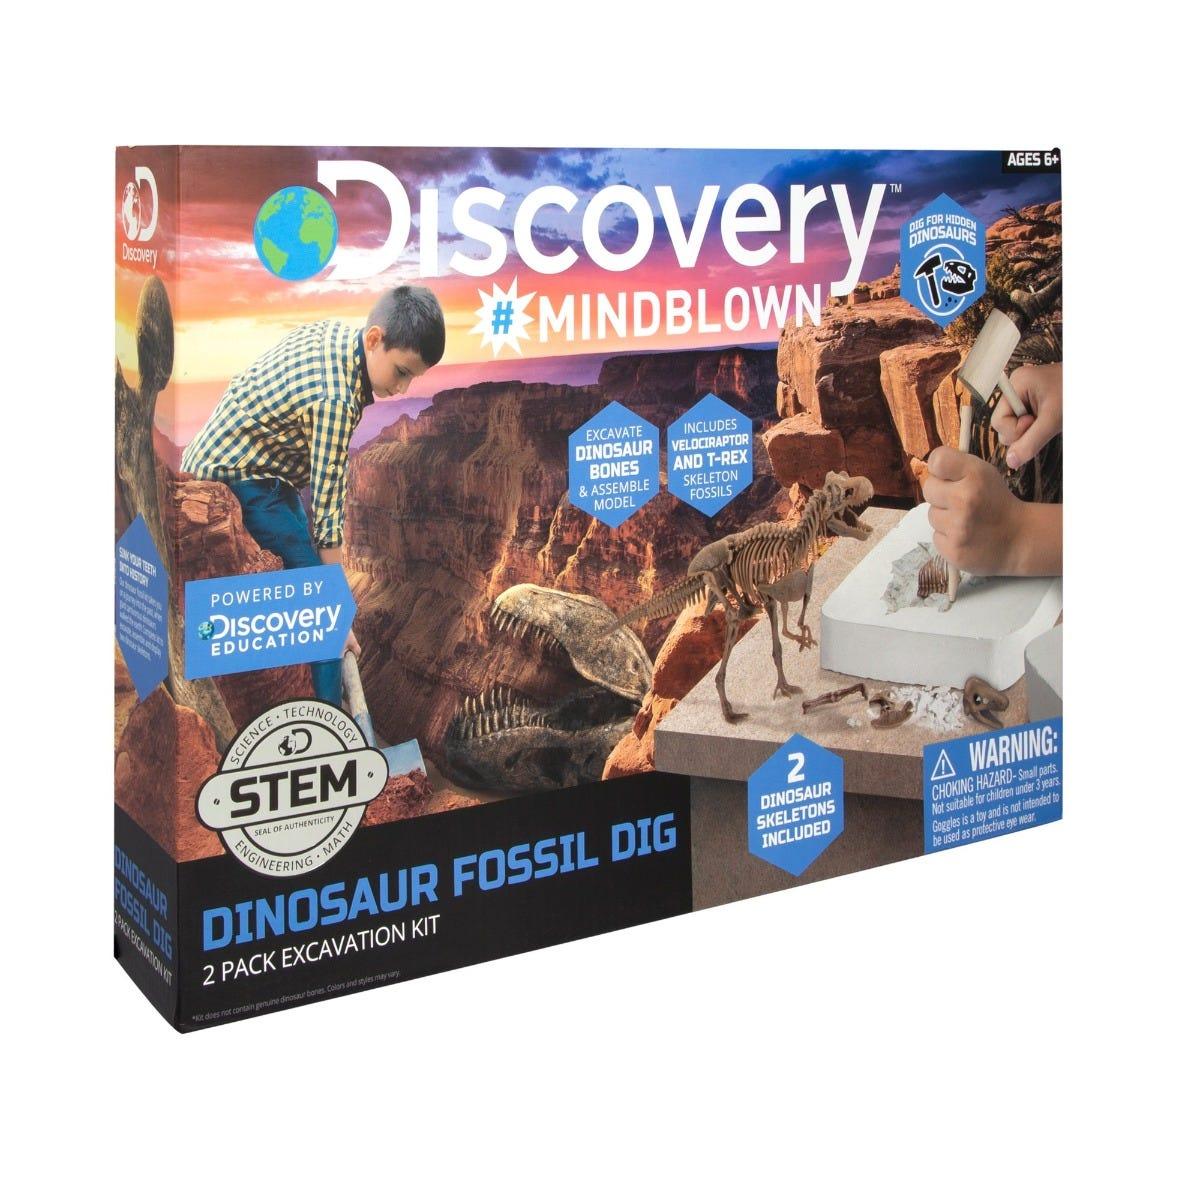 Juego de excavación para encontrar fósiles Discovery®